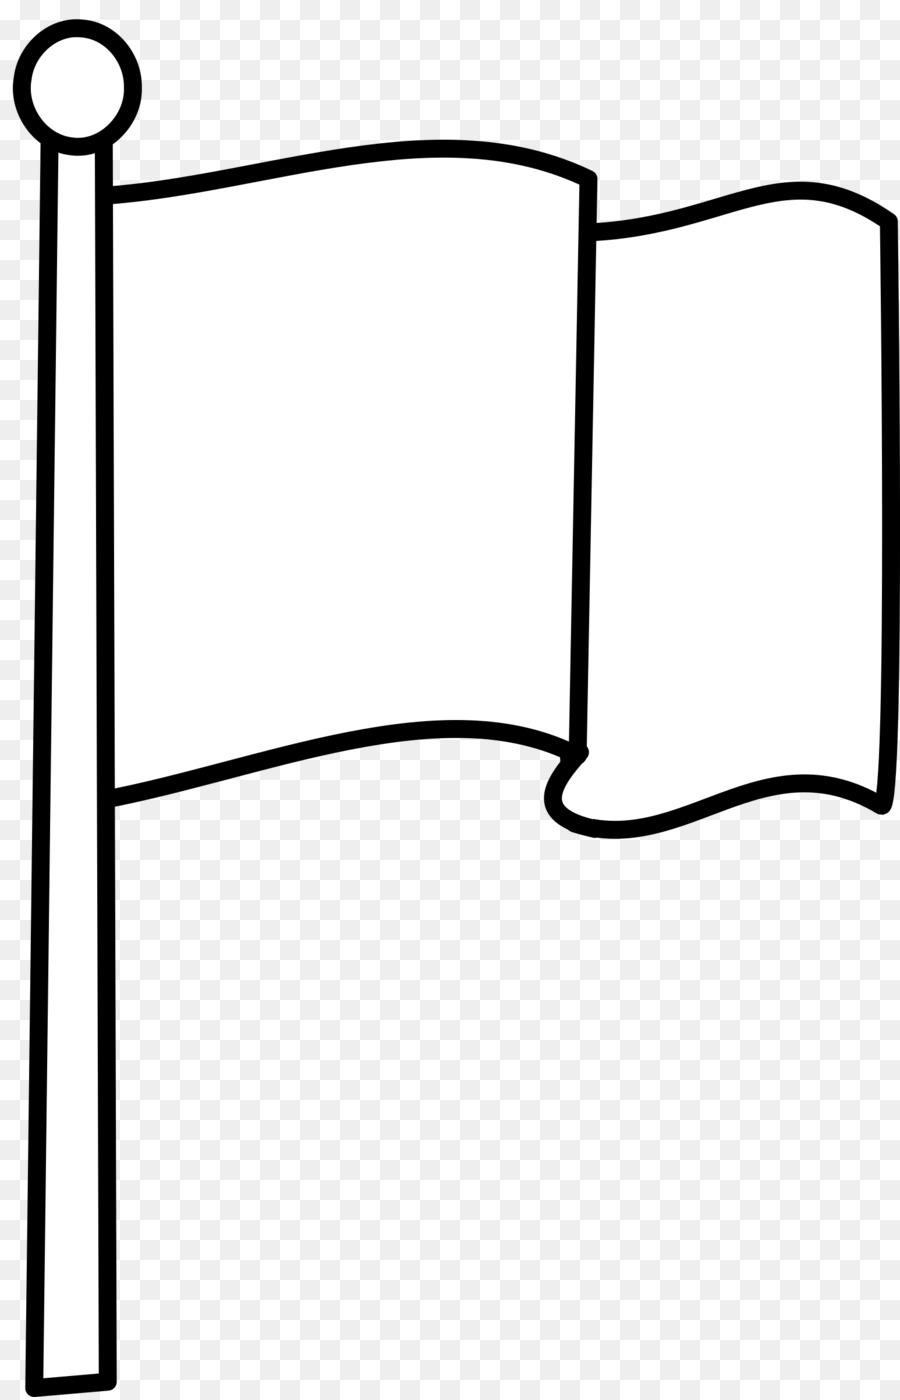 white flag flag of the united states clip art flag png download rh kisspng com black and white american flag clip art free black and white checkered flag clip art